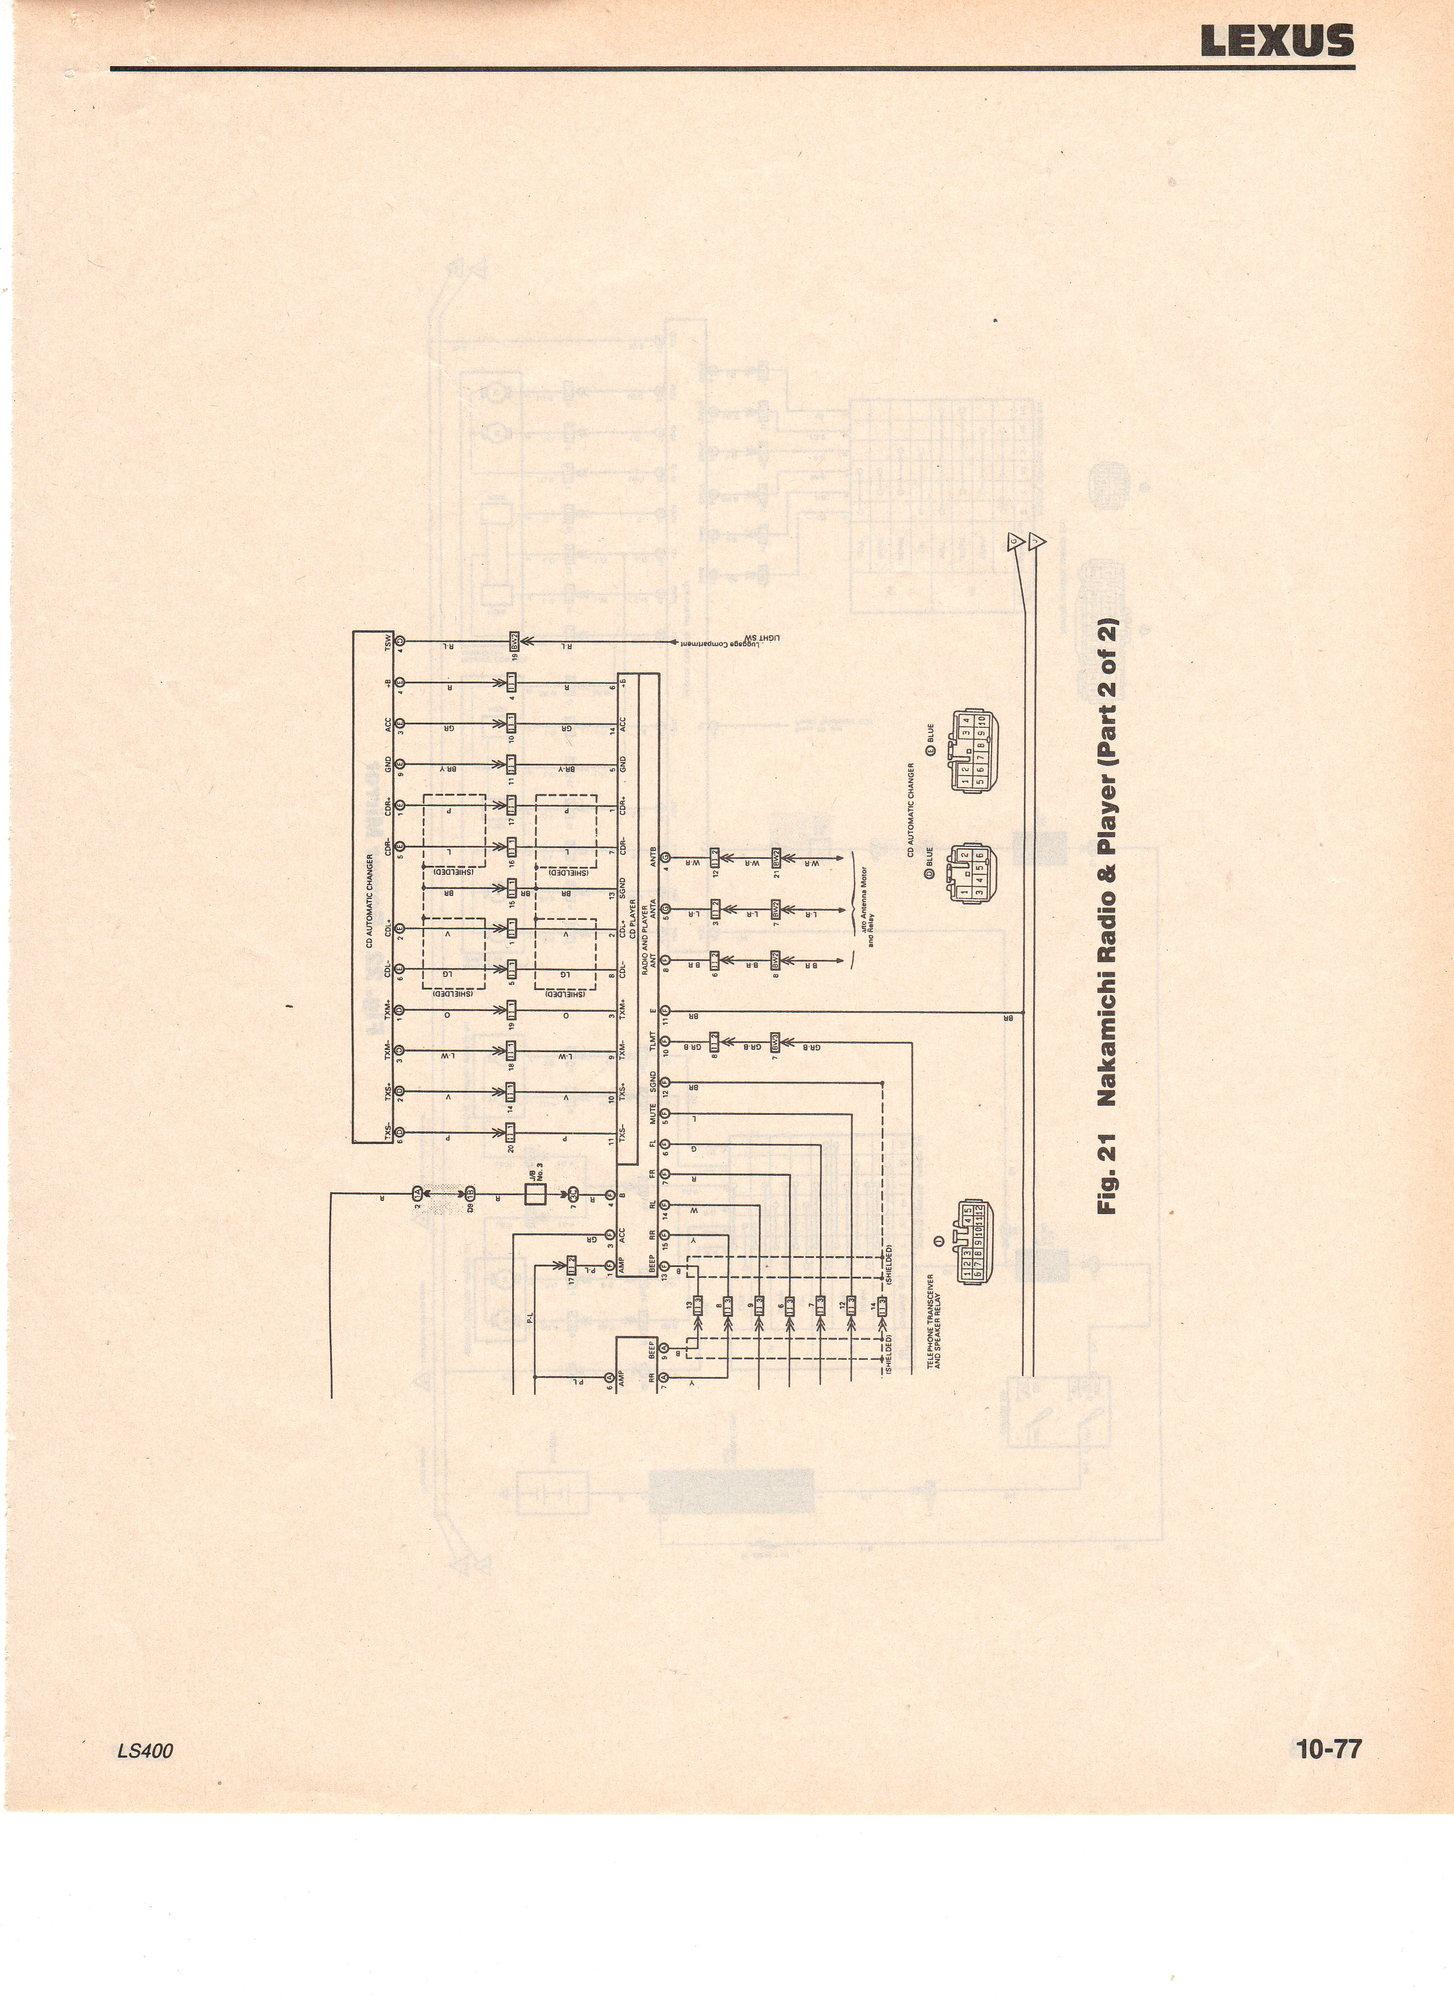 1994 Ls400 Wiring Diagrams Finally 1uzfe Swap Info Clublexus Lexus Forum Discussion